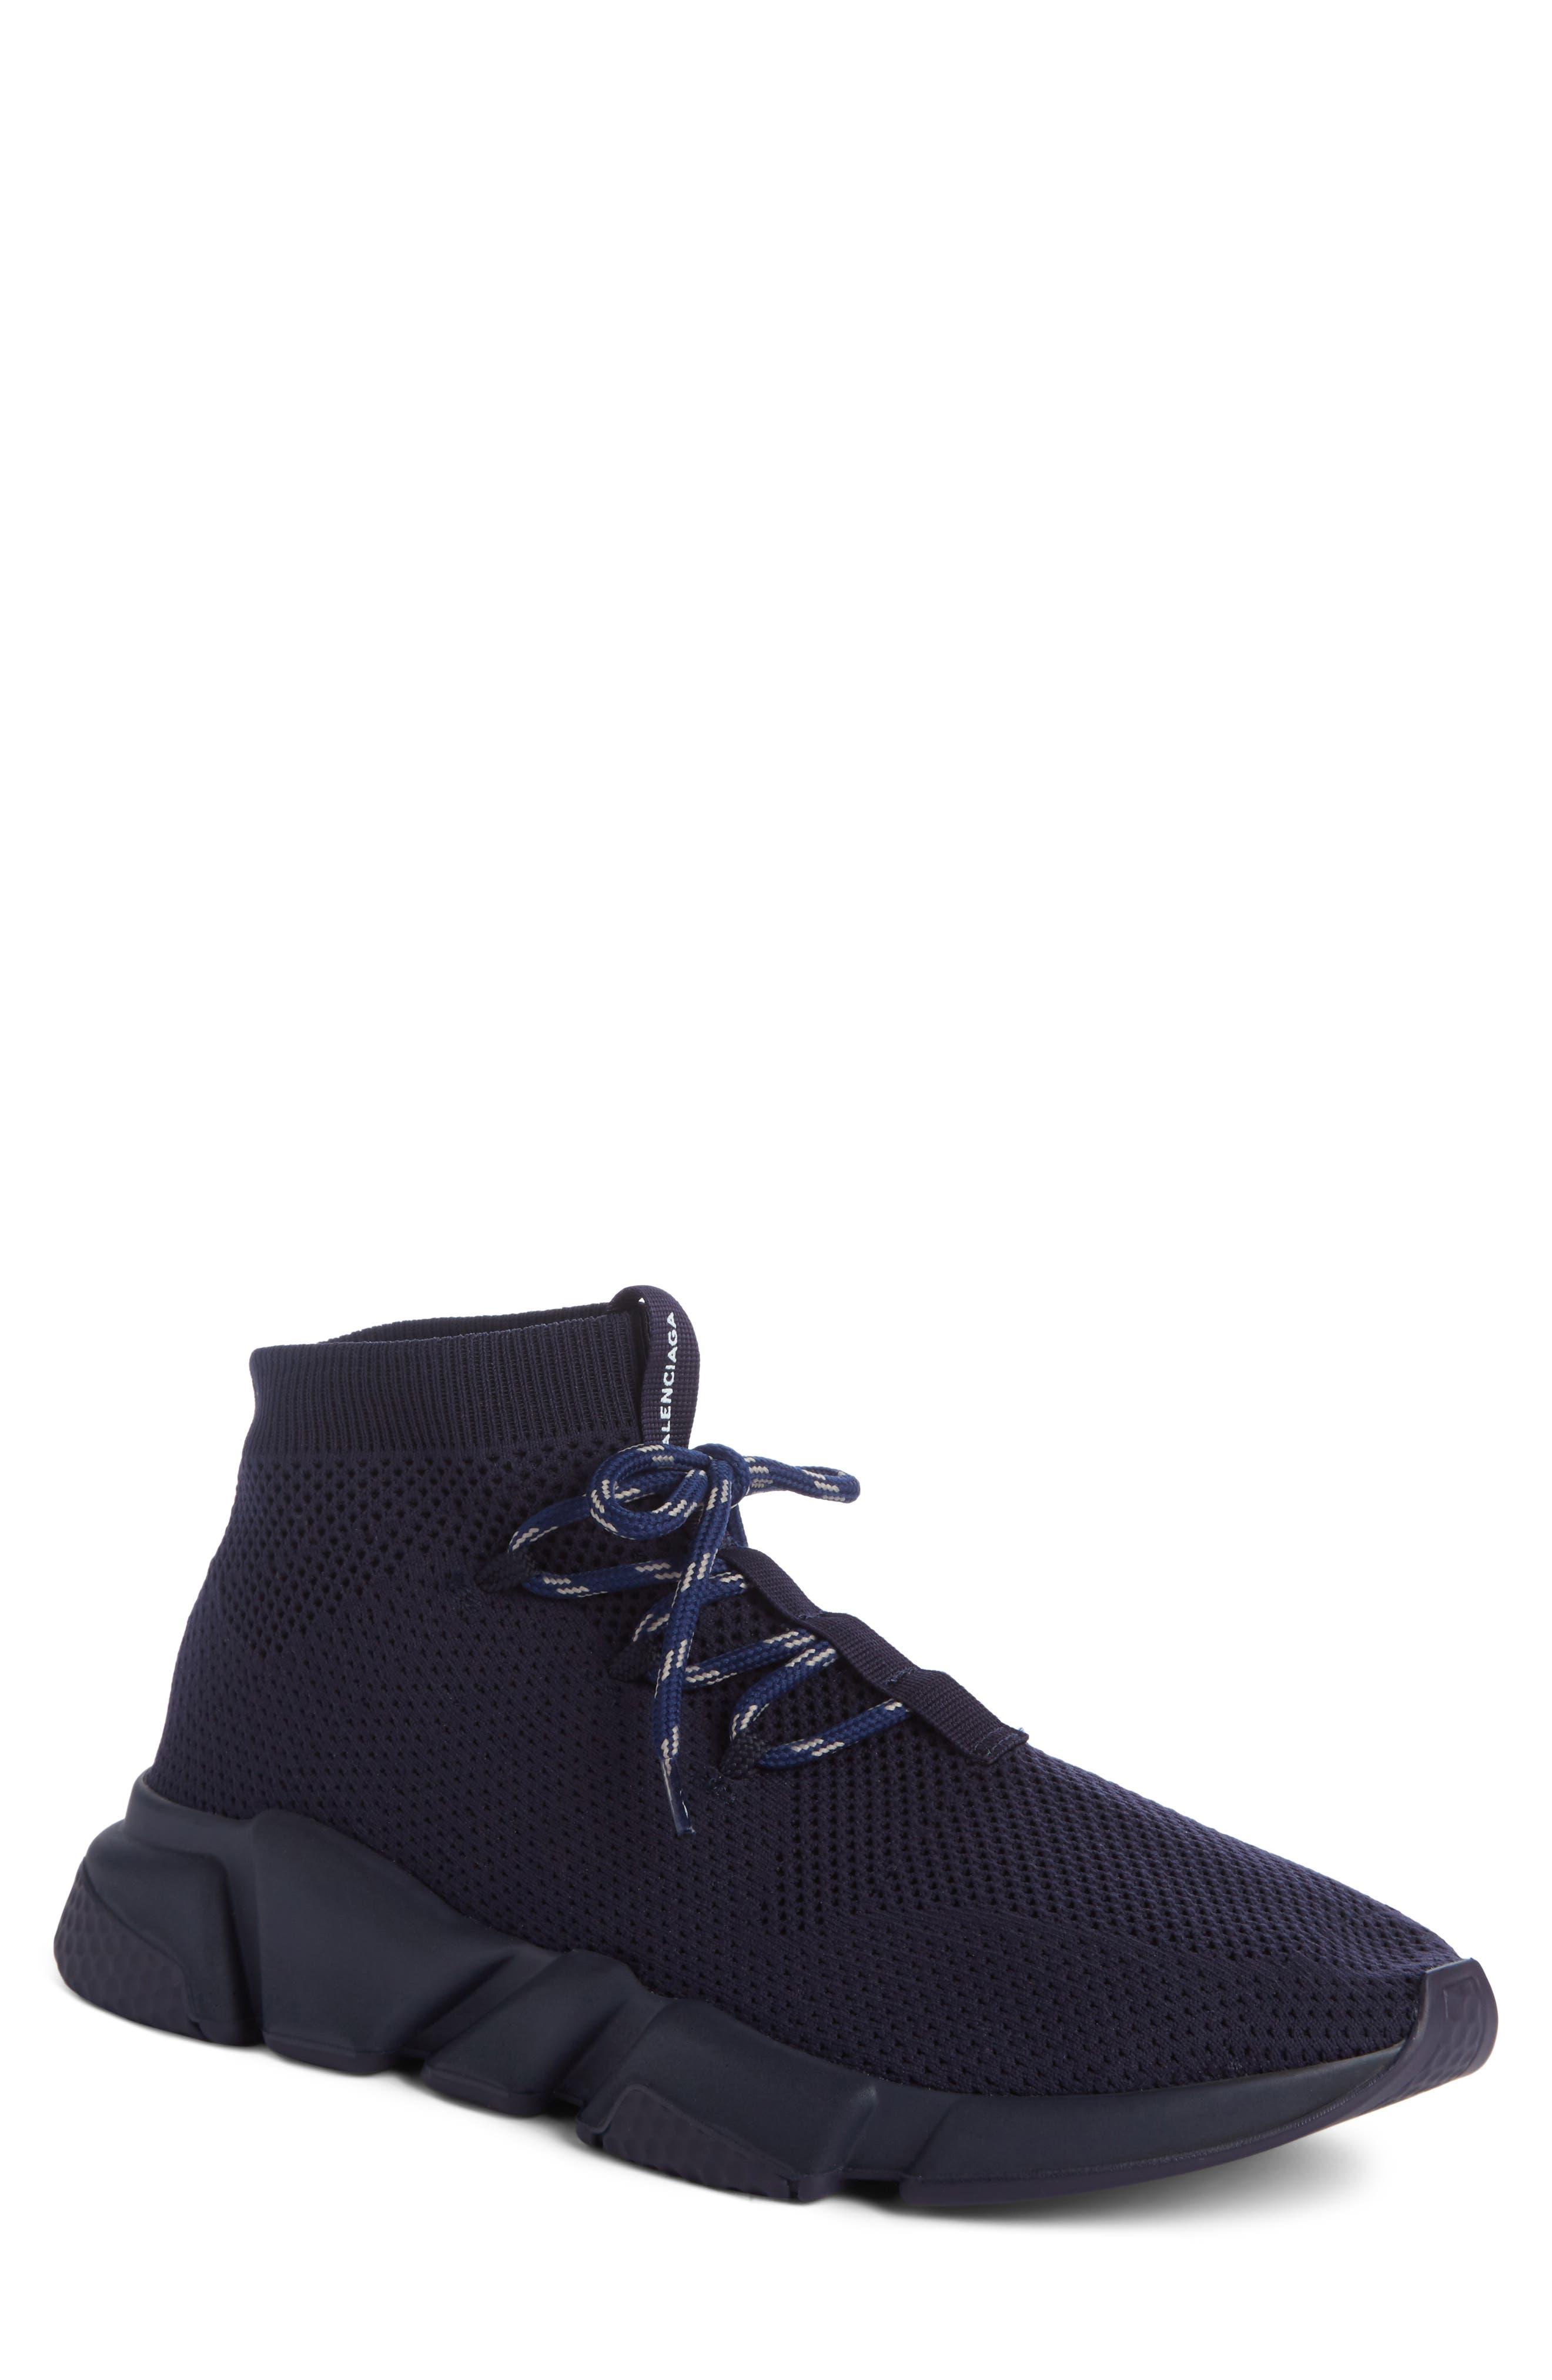 Mid-Top Sneaker,                             Main thumbnail 1, color,                             Blue Marine/Blanc White